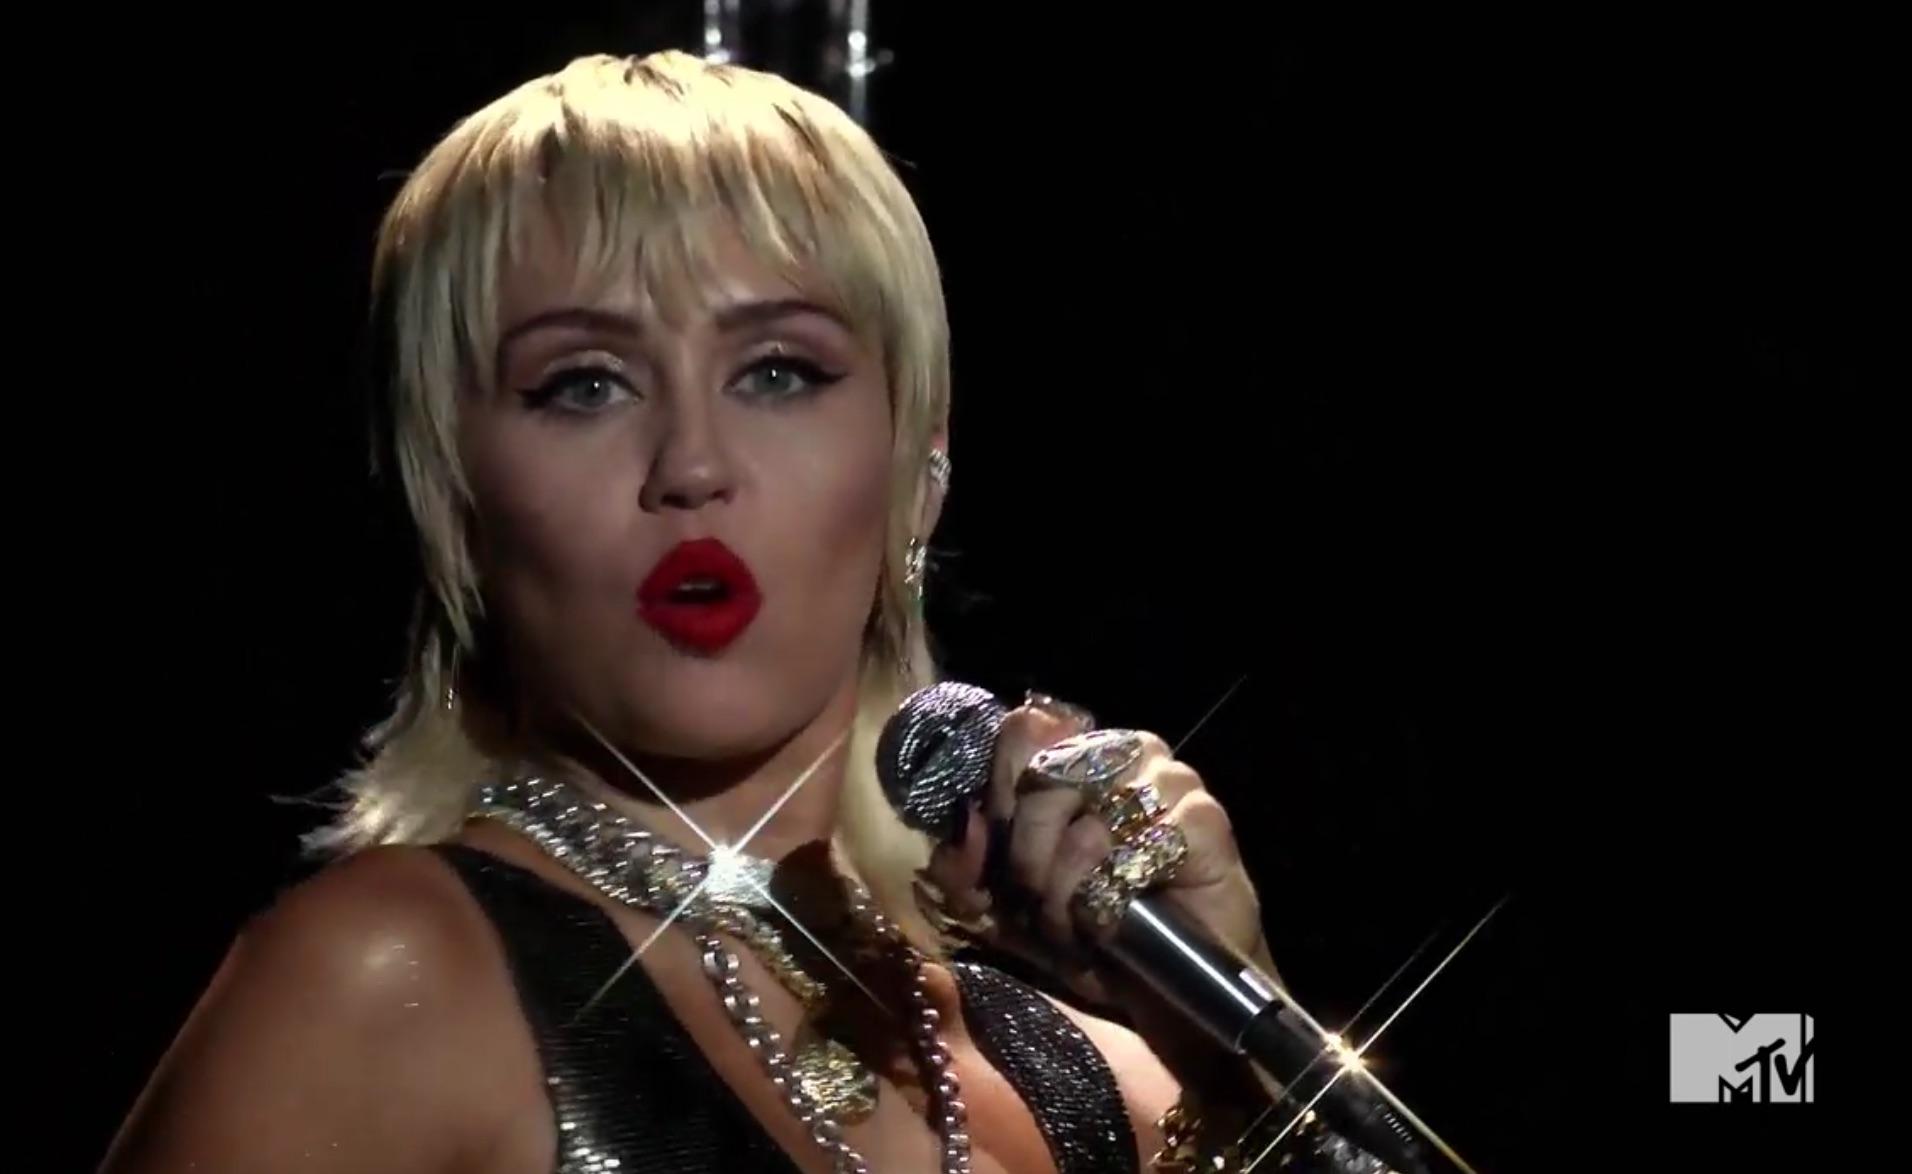 Miley Cyrus 2020 Vmas Performance Watch Her Ride Wrecking Ball